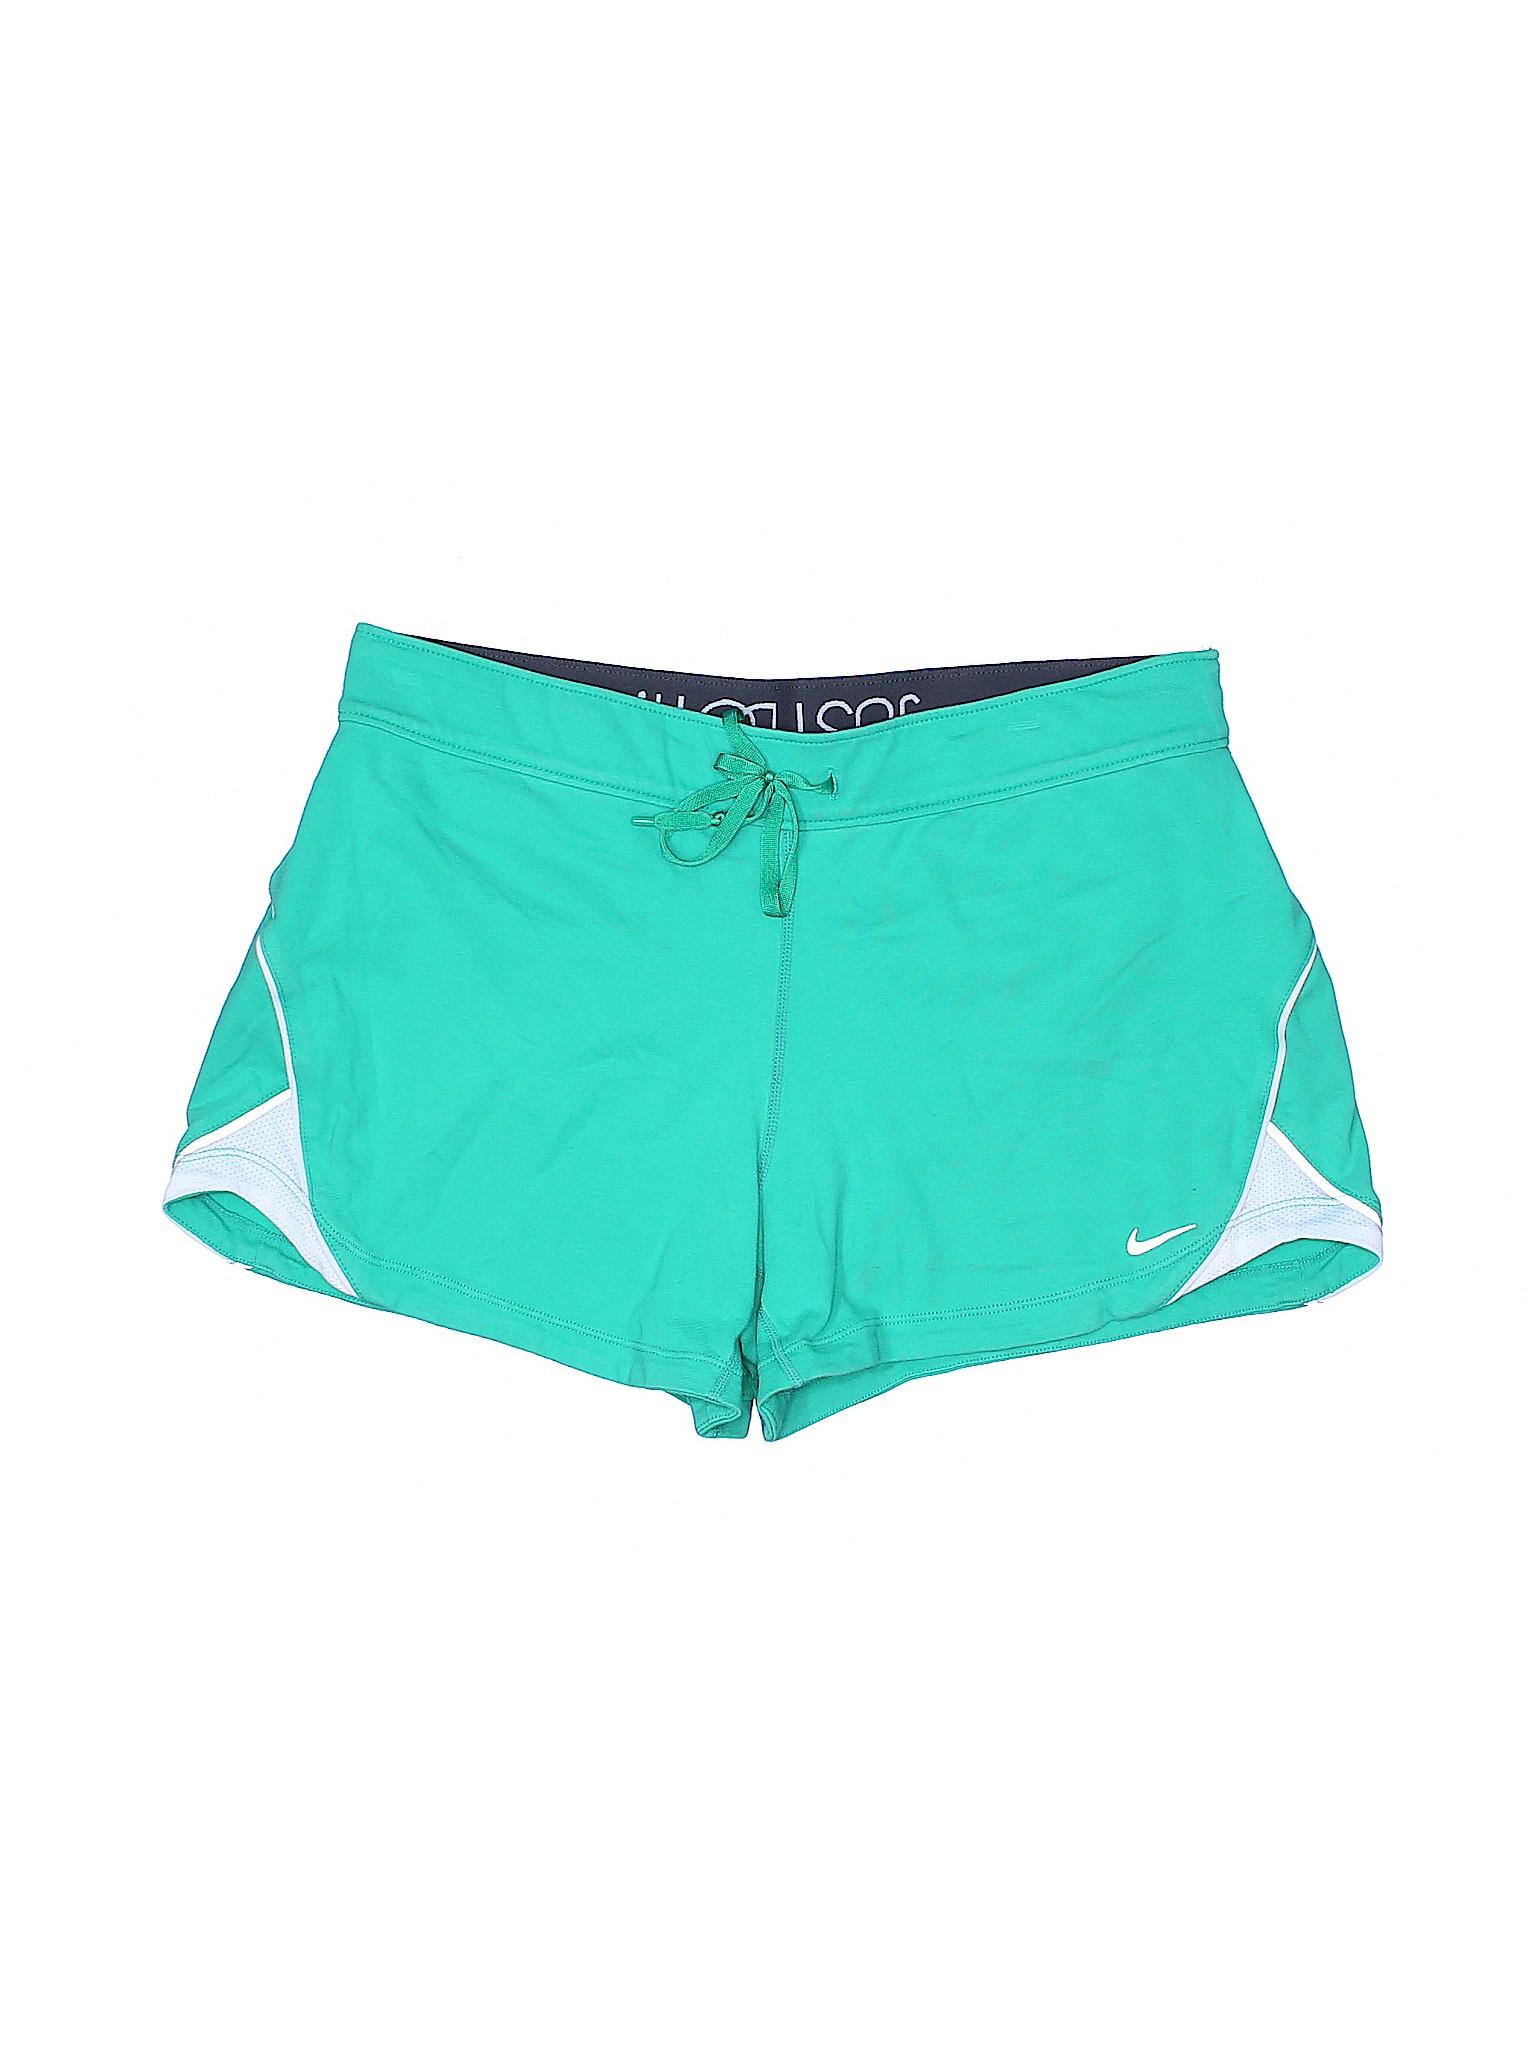 Shorts Athletic Nike Athletic Boutique Boutique Shorts Nike Boutique pU5qB